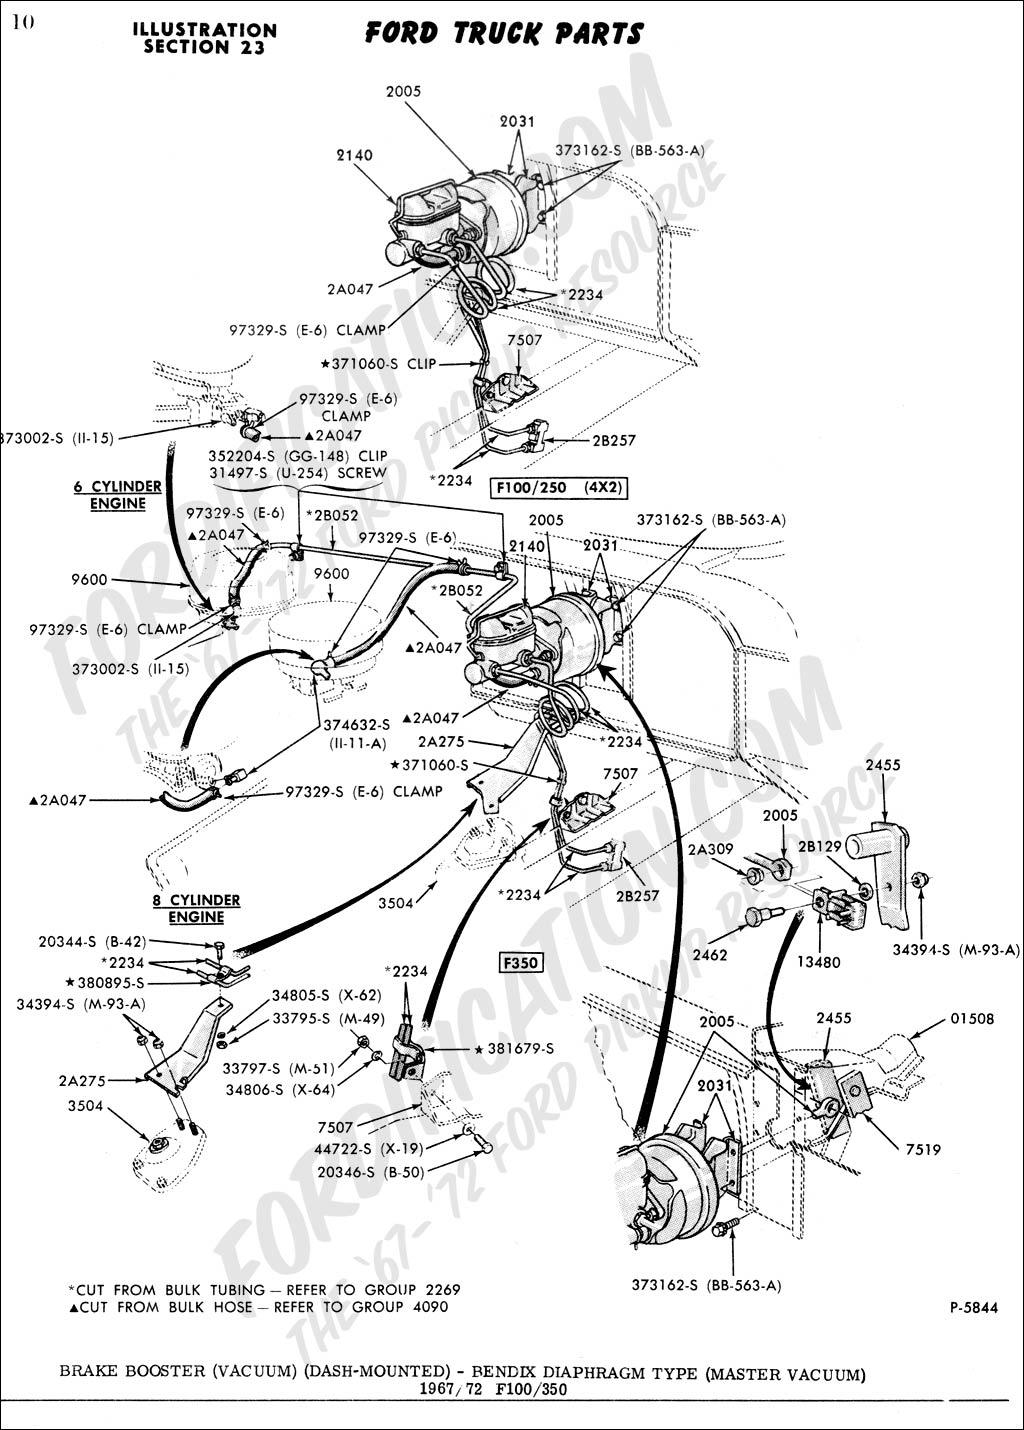 wiring diagram for brake booster